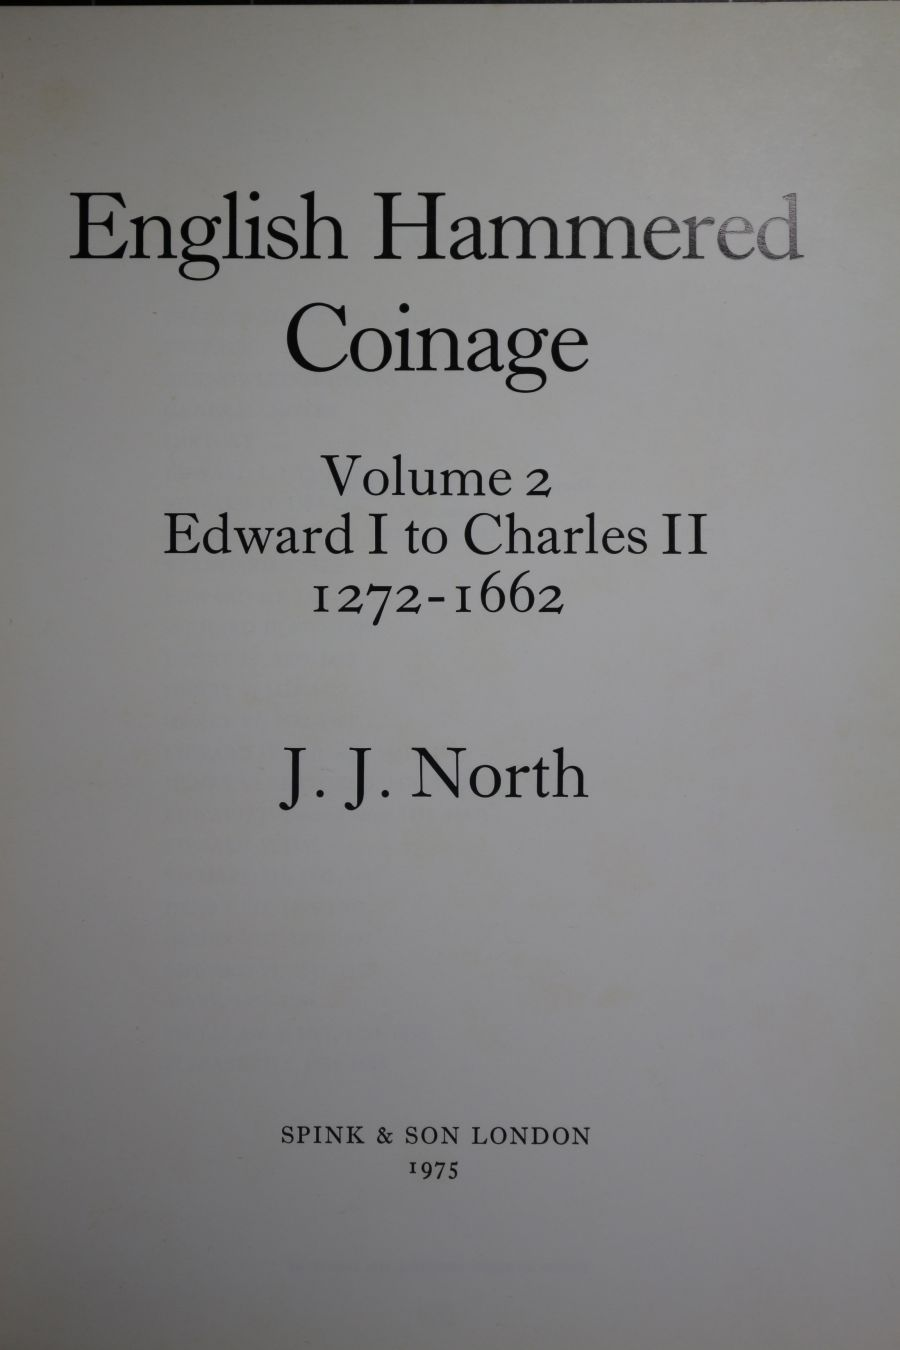 J.J. North